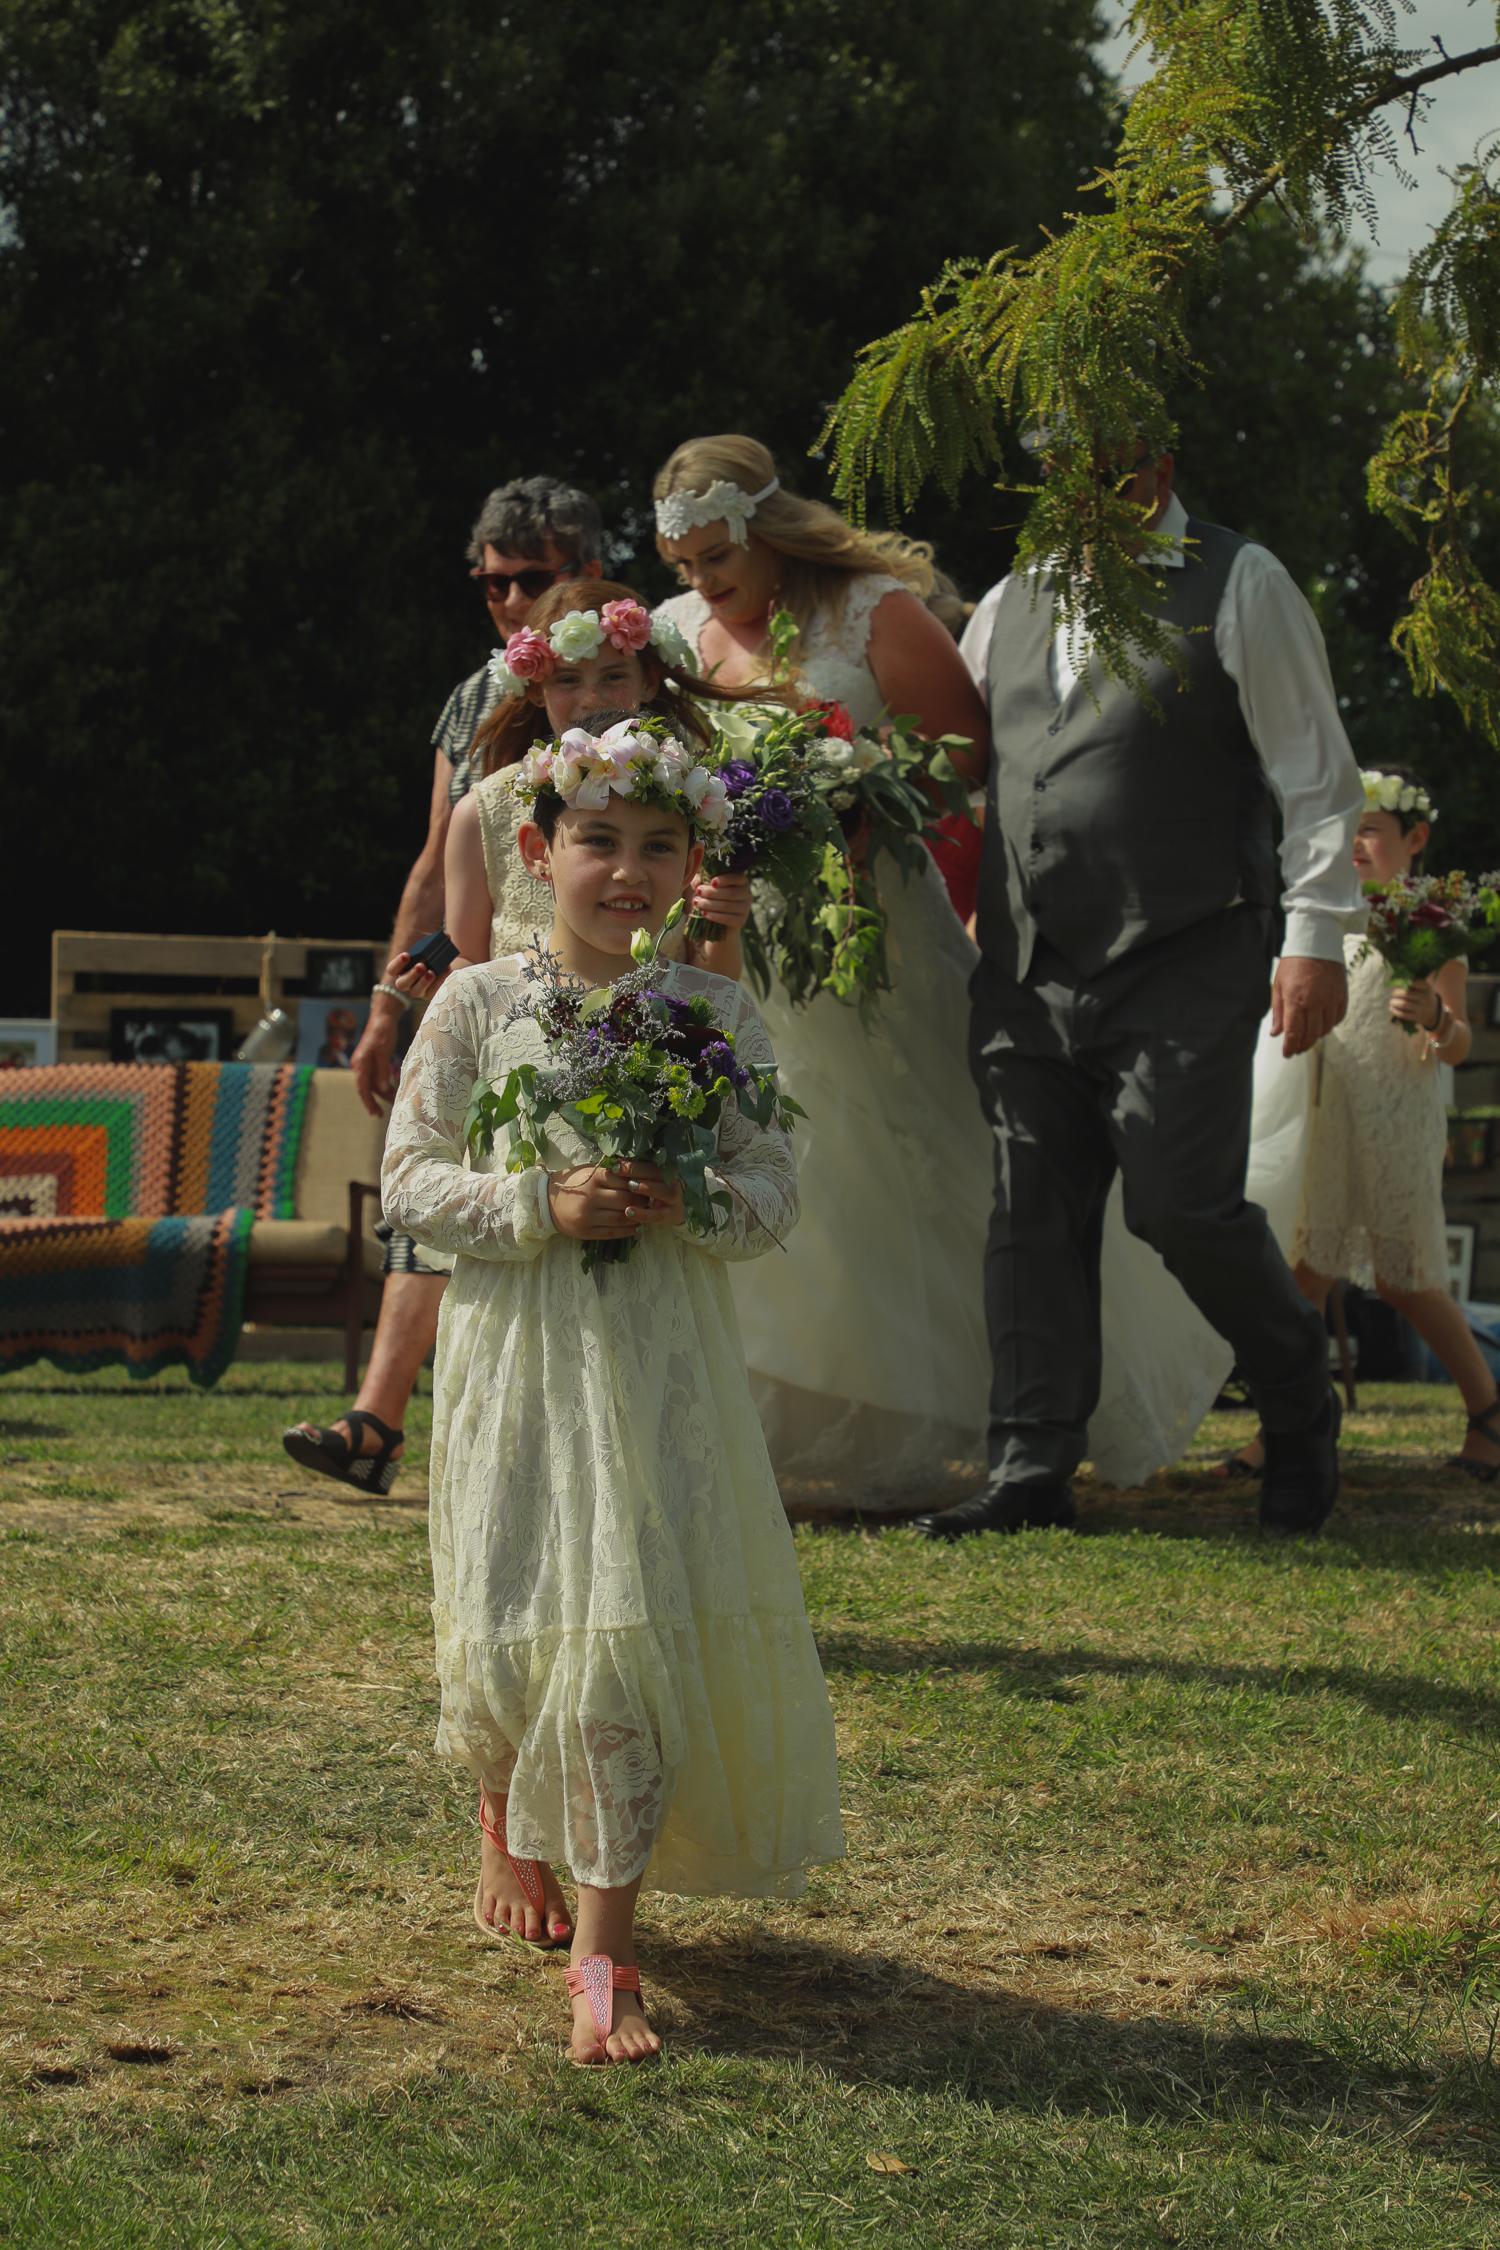 wedding-photography-flower-girl-walking-in.jpg